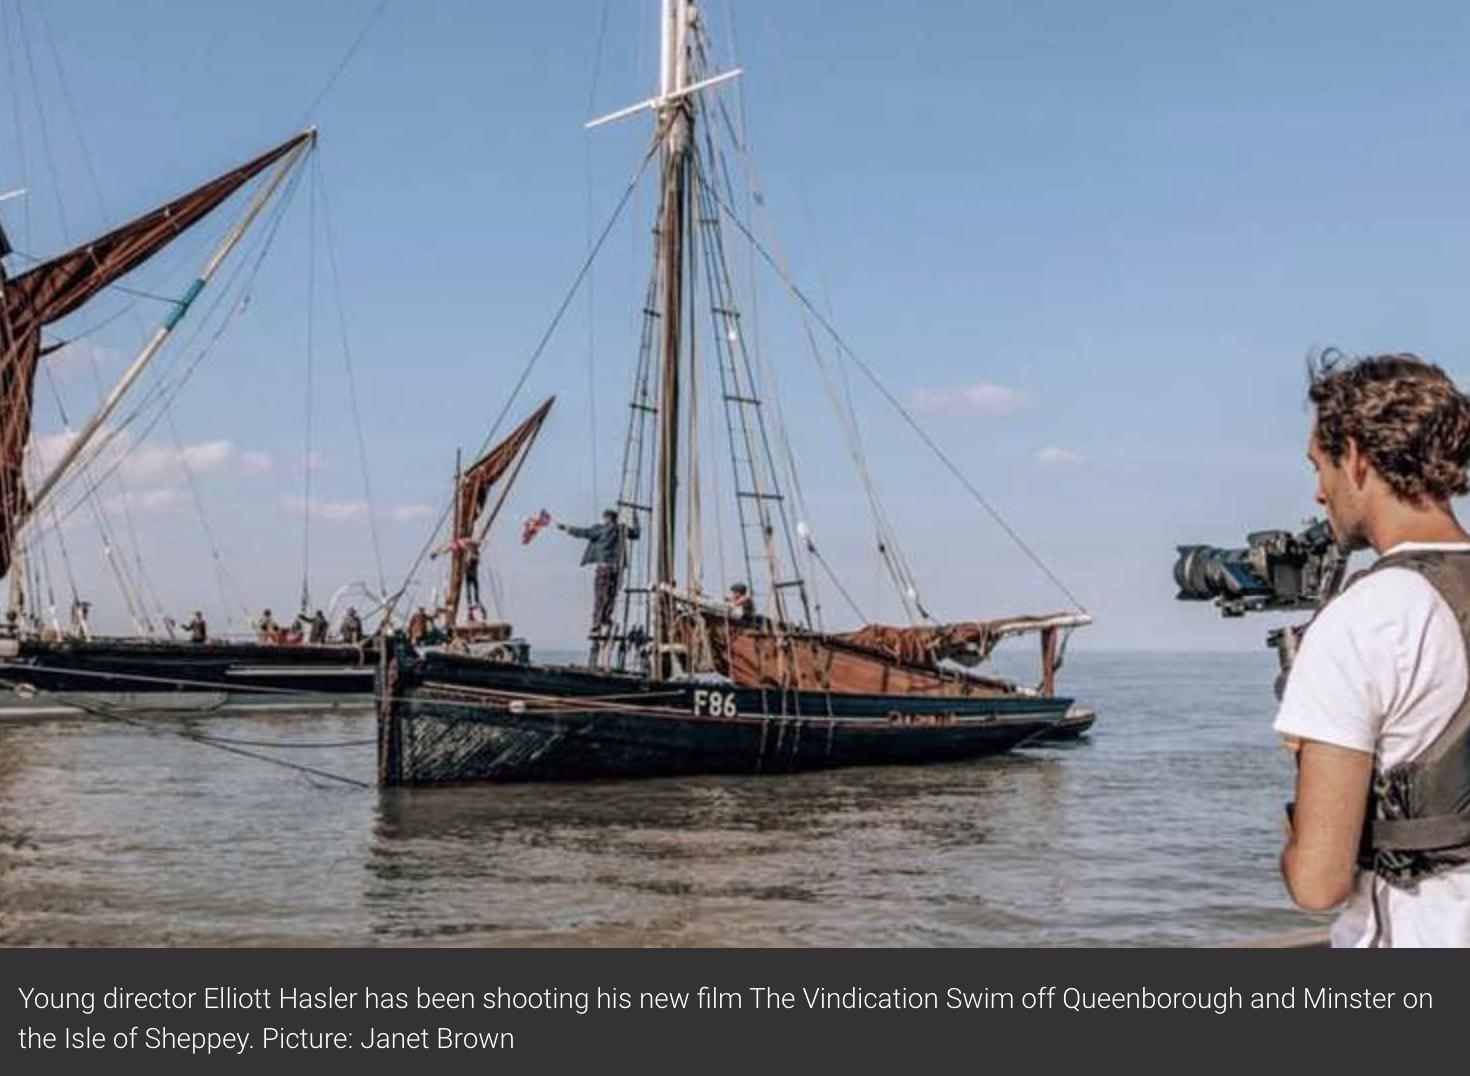 Kent Online: 'Vindication Swim' film crew shoots scenes of Thames barges off Sheppey